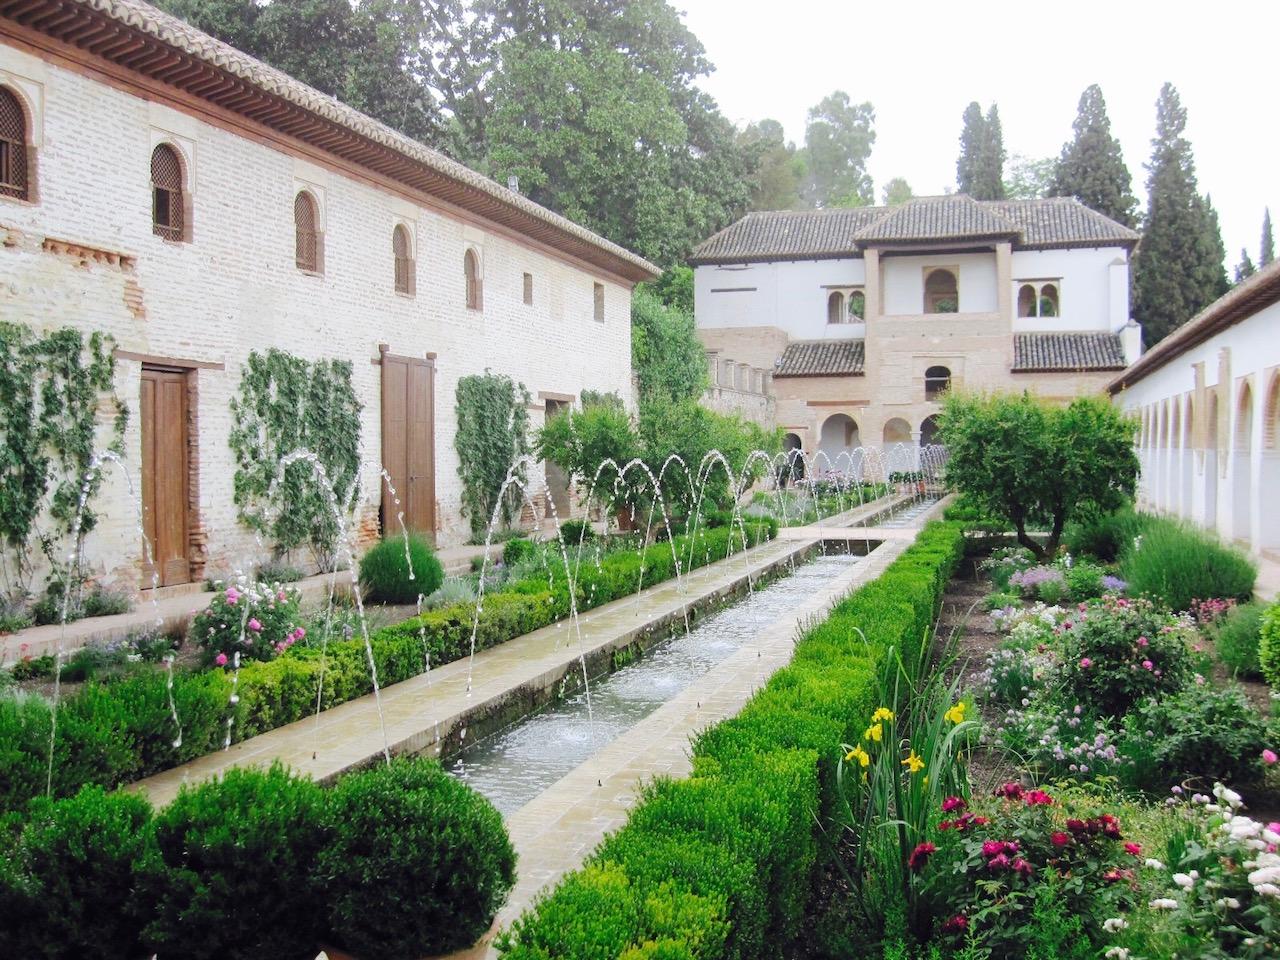 Alhambra, Gärten, Granada, Andalusien